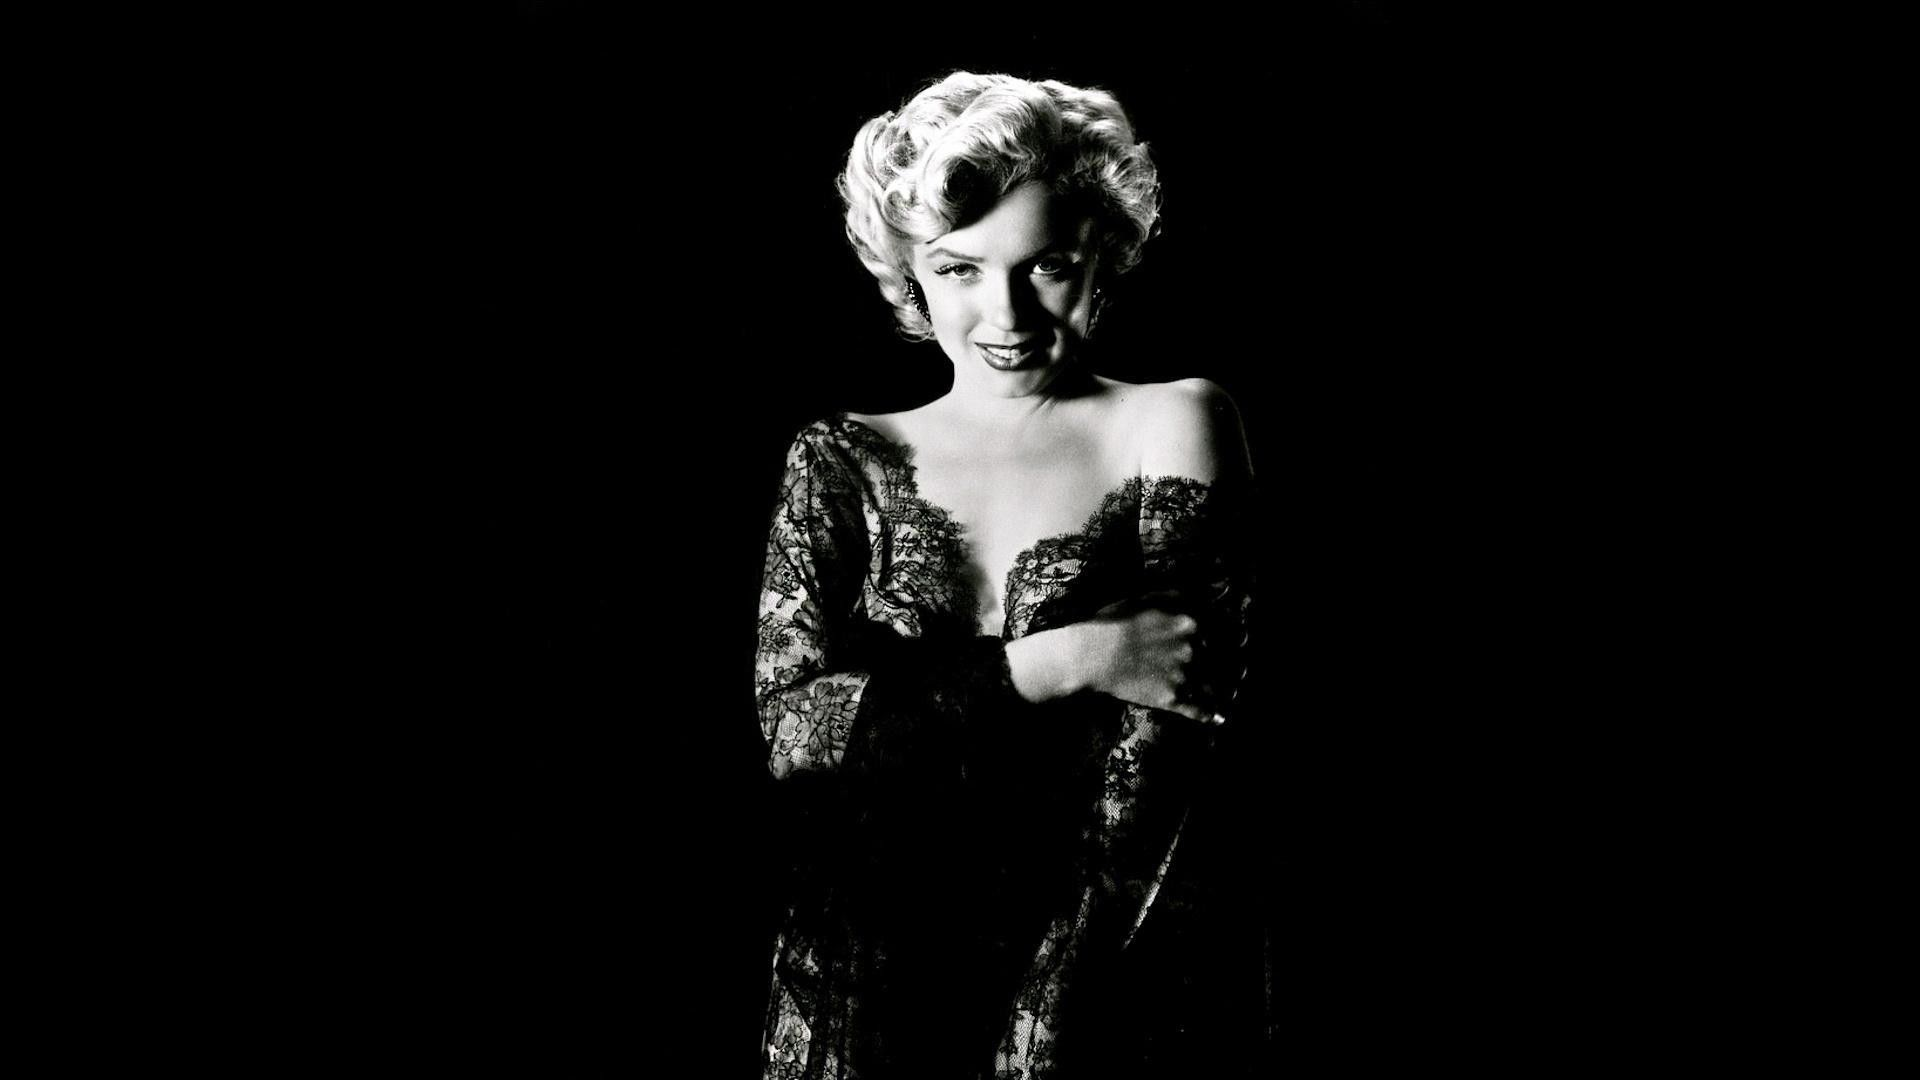 fond ecran celebrite marilyn monroe noir et blanc